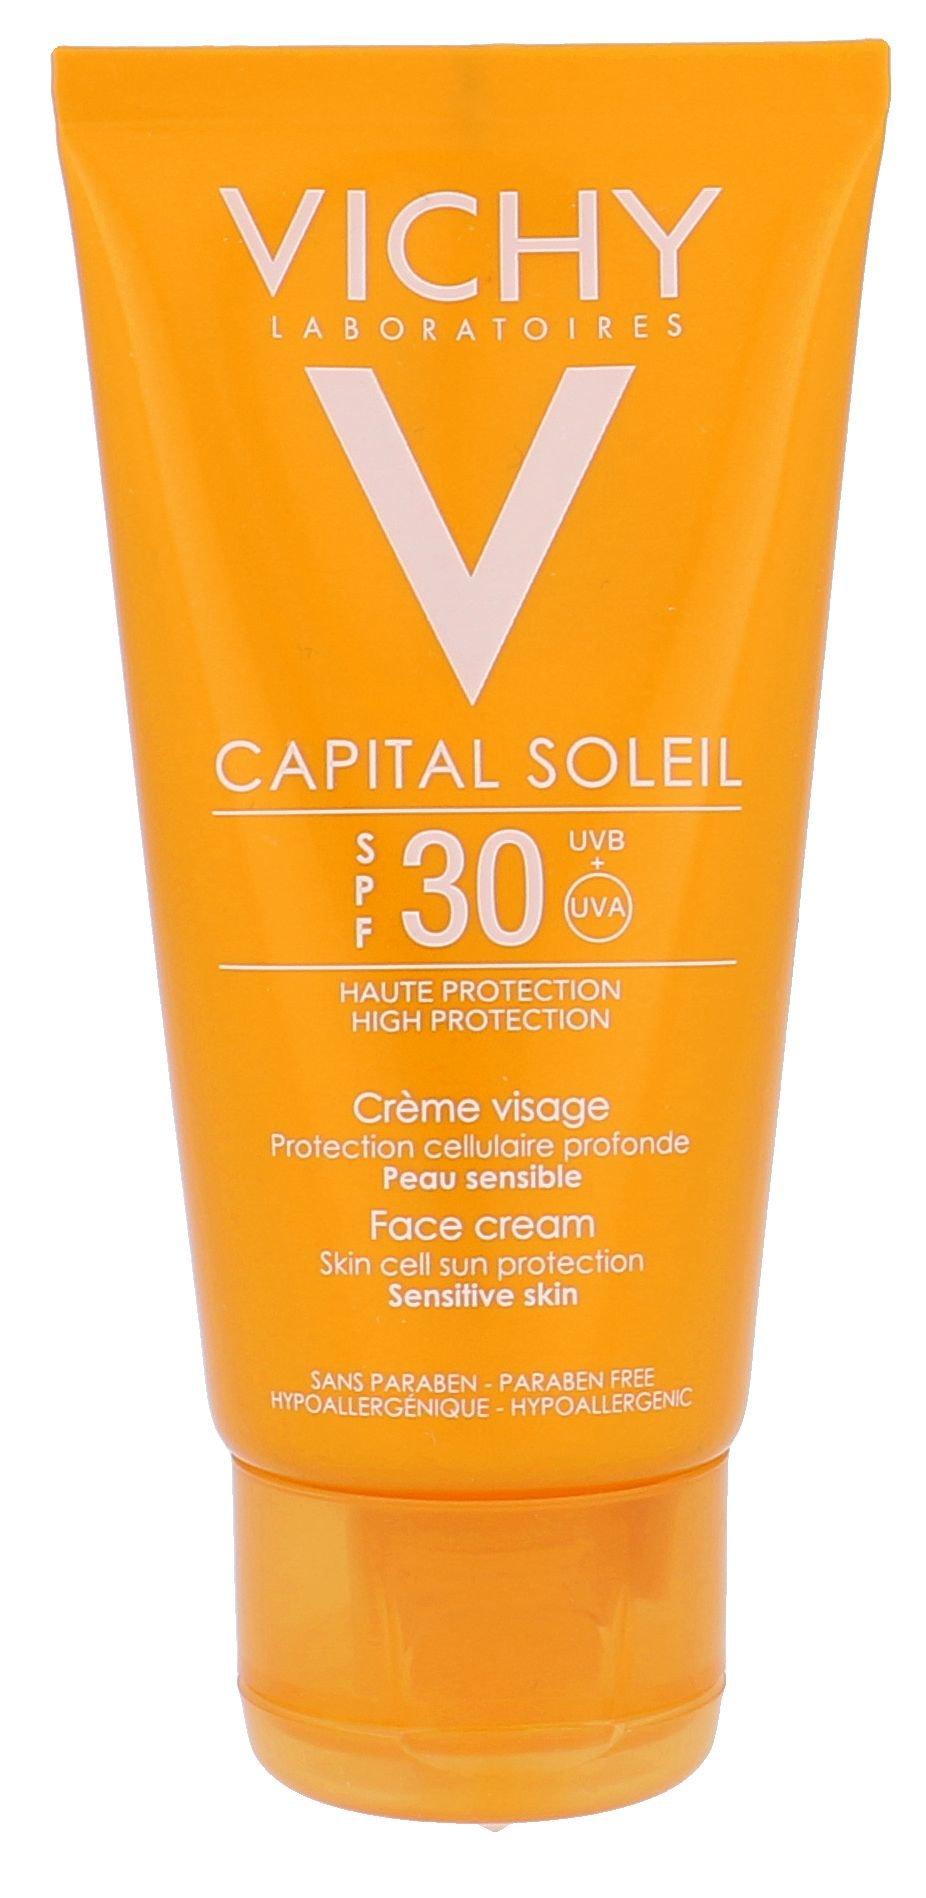 Vichy Capital Soleil Cosmetic 50ml